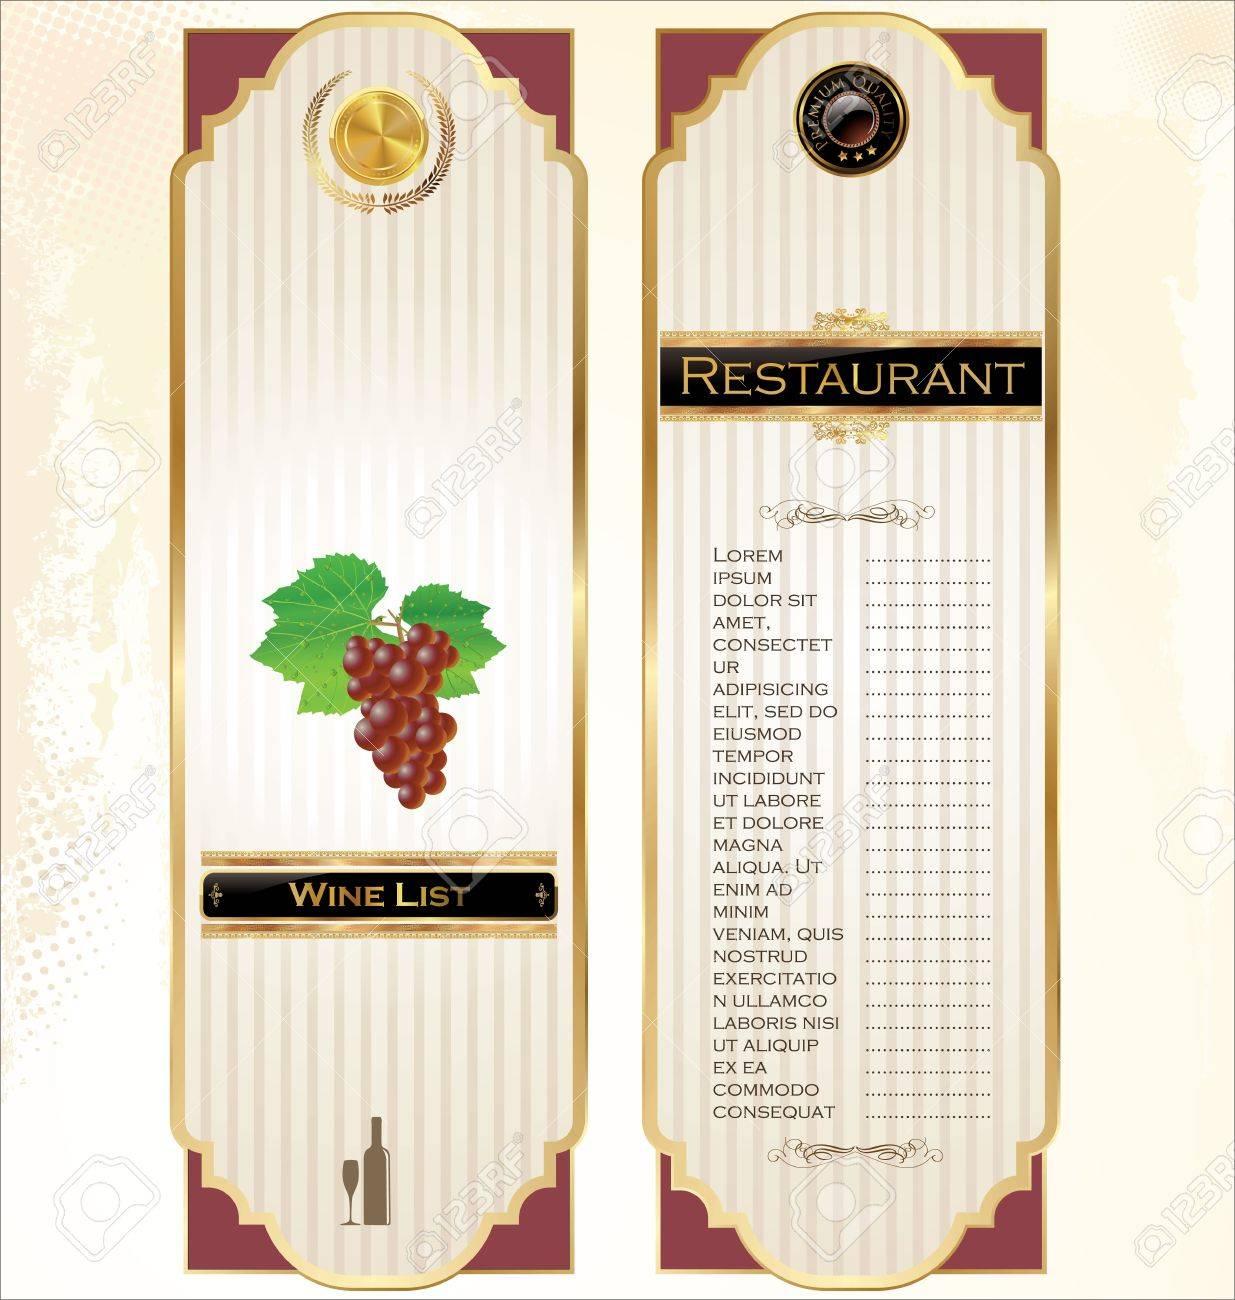 Doc13001390 Free Wine List Template Wine List Template Vector – Sample Wine Menu Template